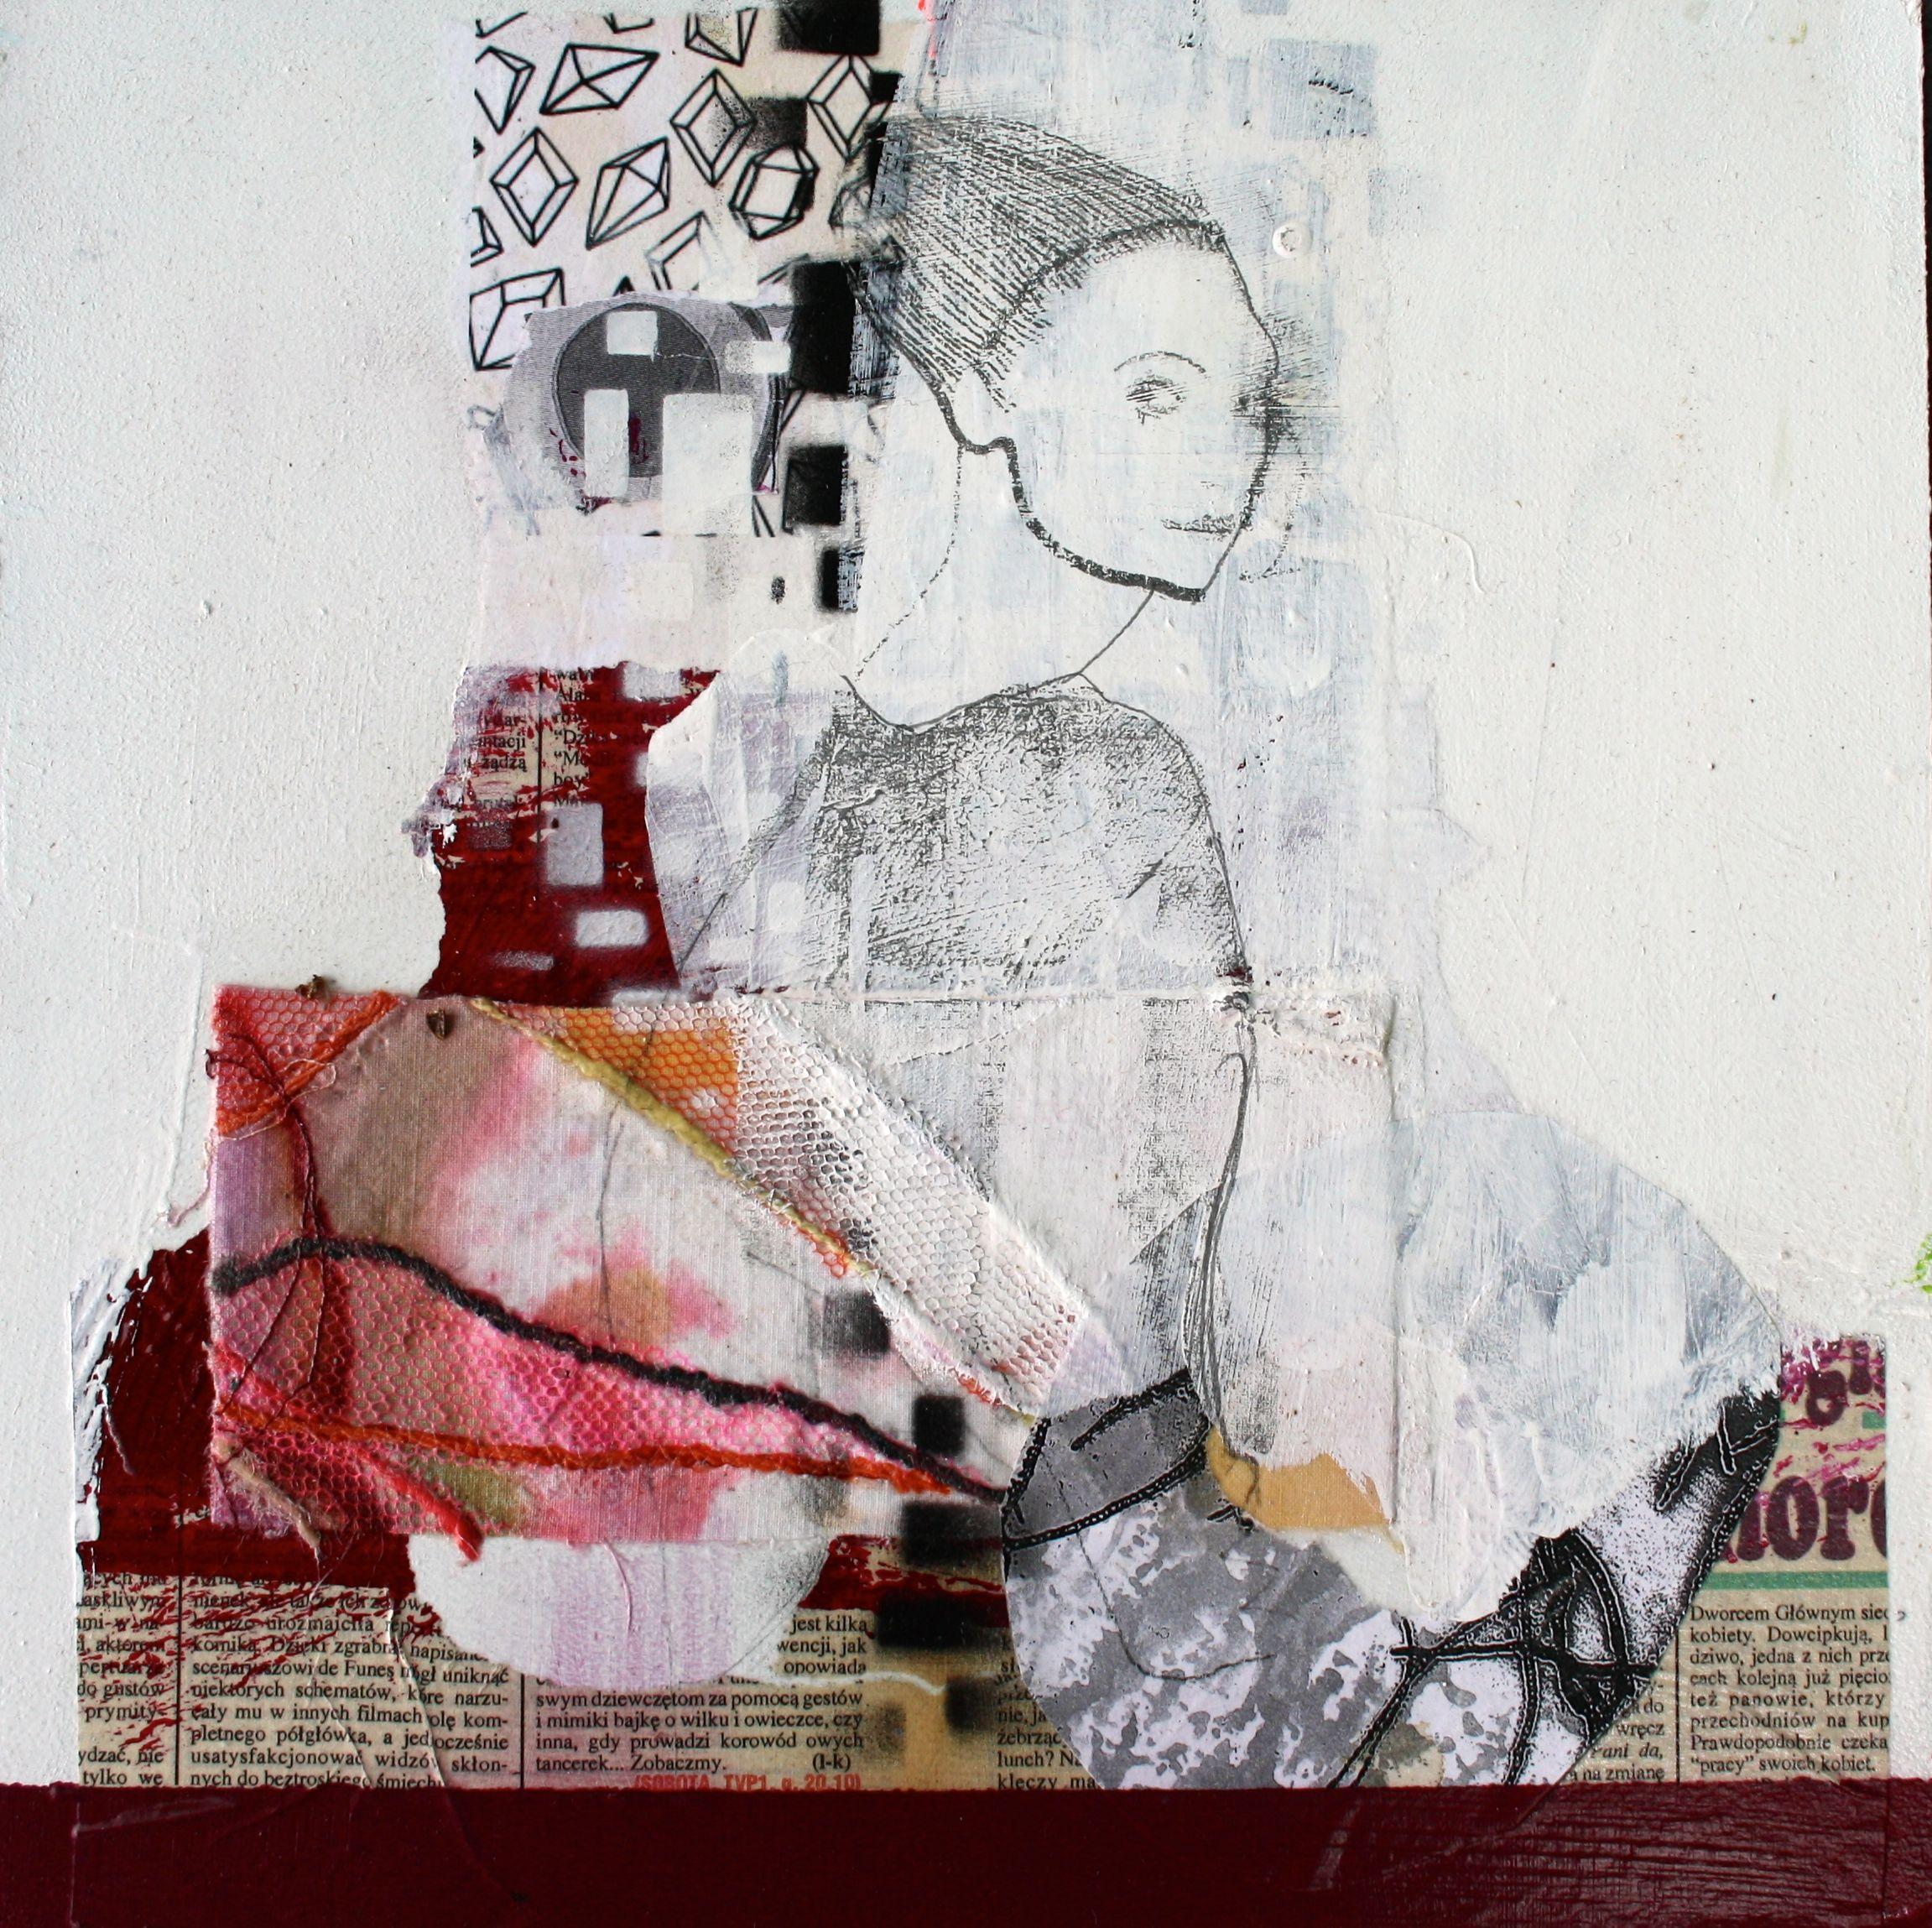 Mennesker Maleri Collage Abstrakt Art Udstillinger Kursus Akrylmaleri Rie Brodsgard Kolding Galleri Malerier Akrylmalerier Abstrakt